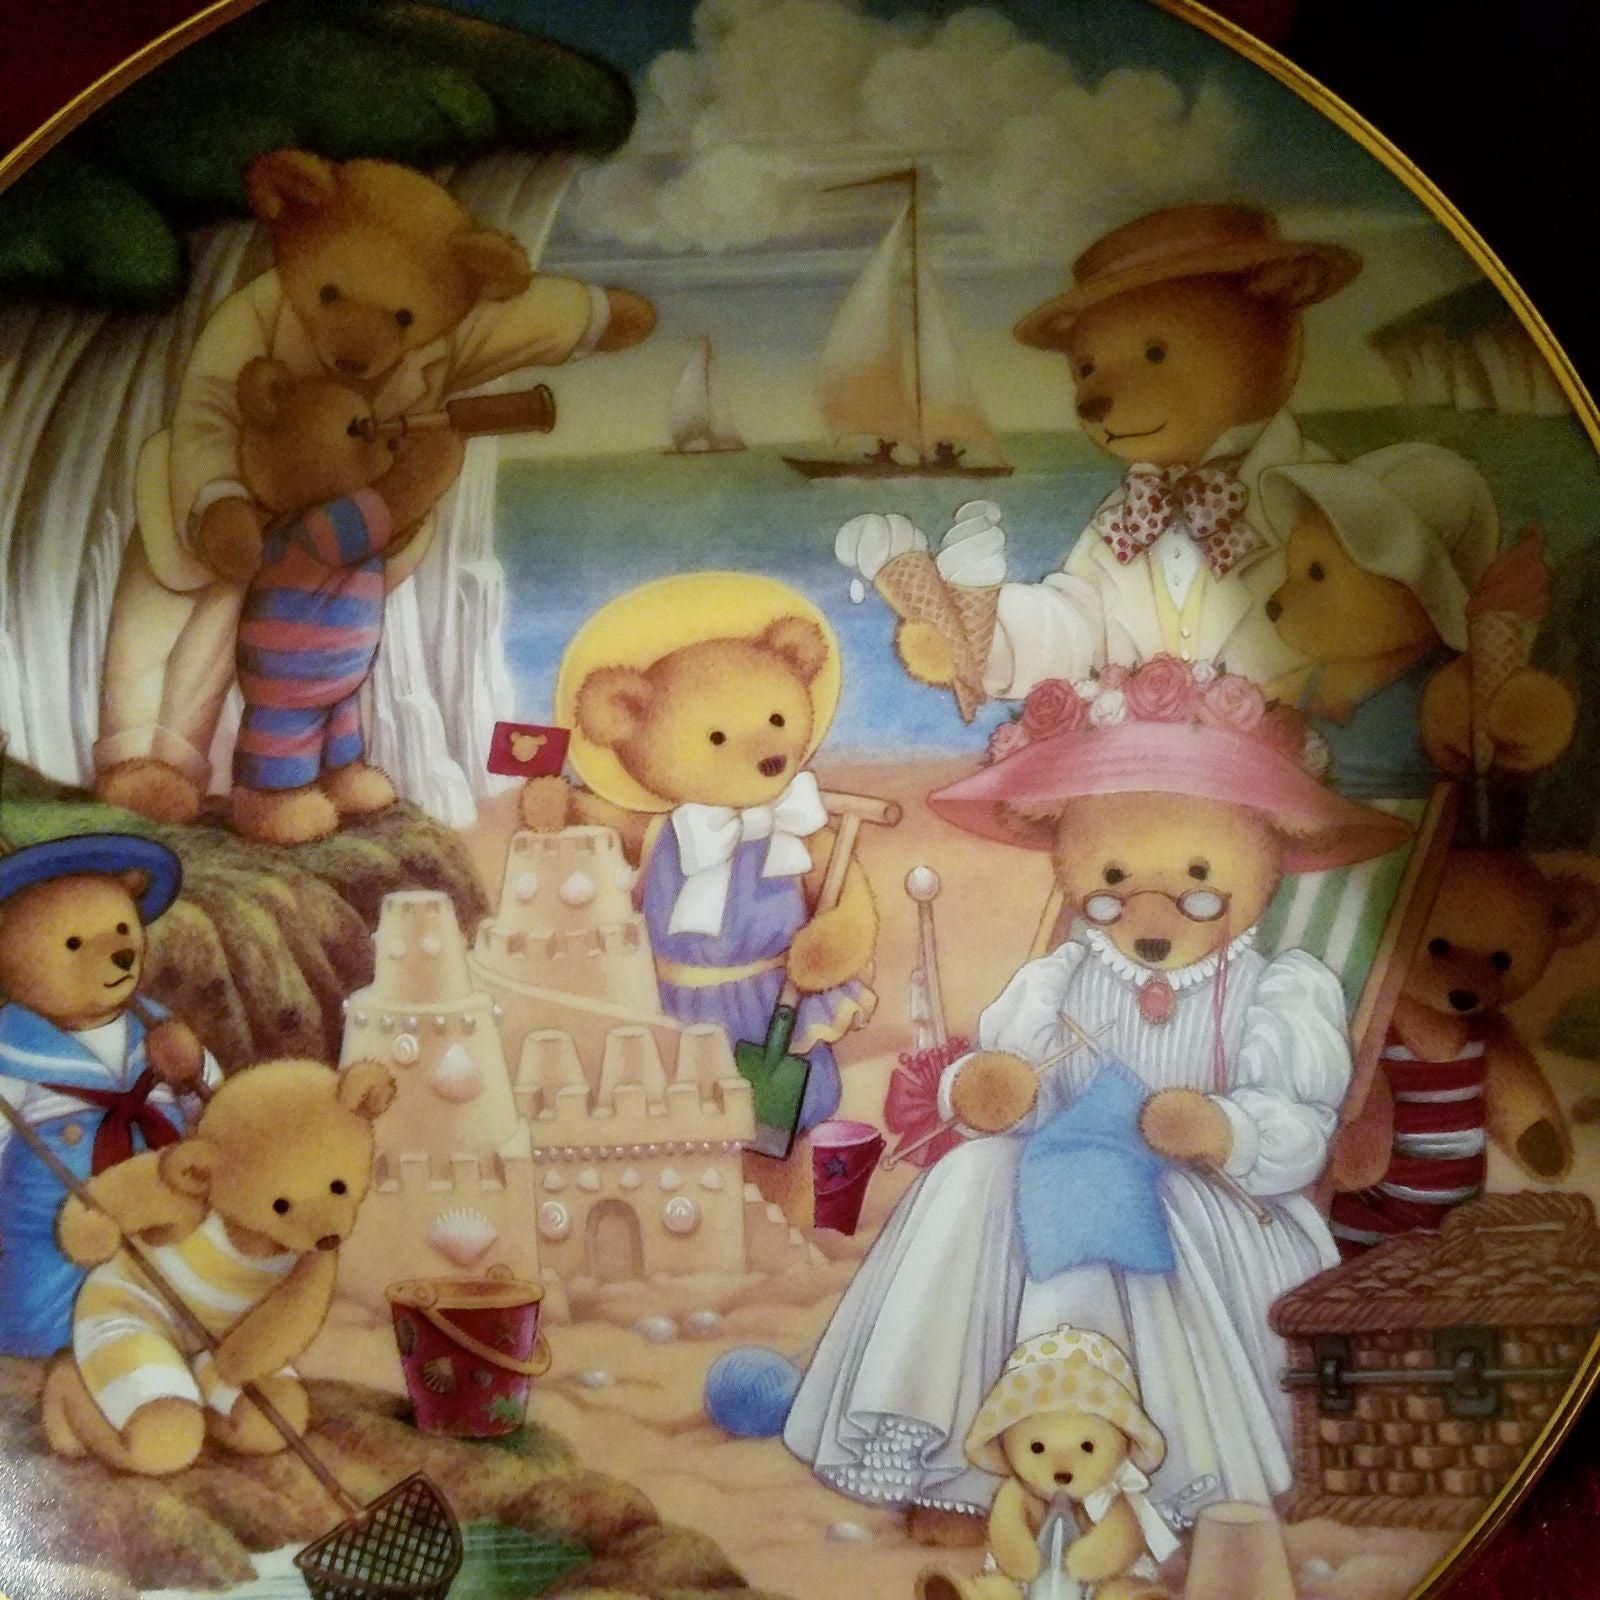 Franklin Mint, Teddy bear beach part pla